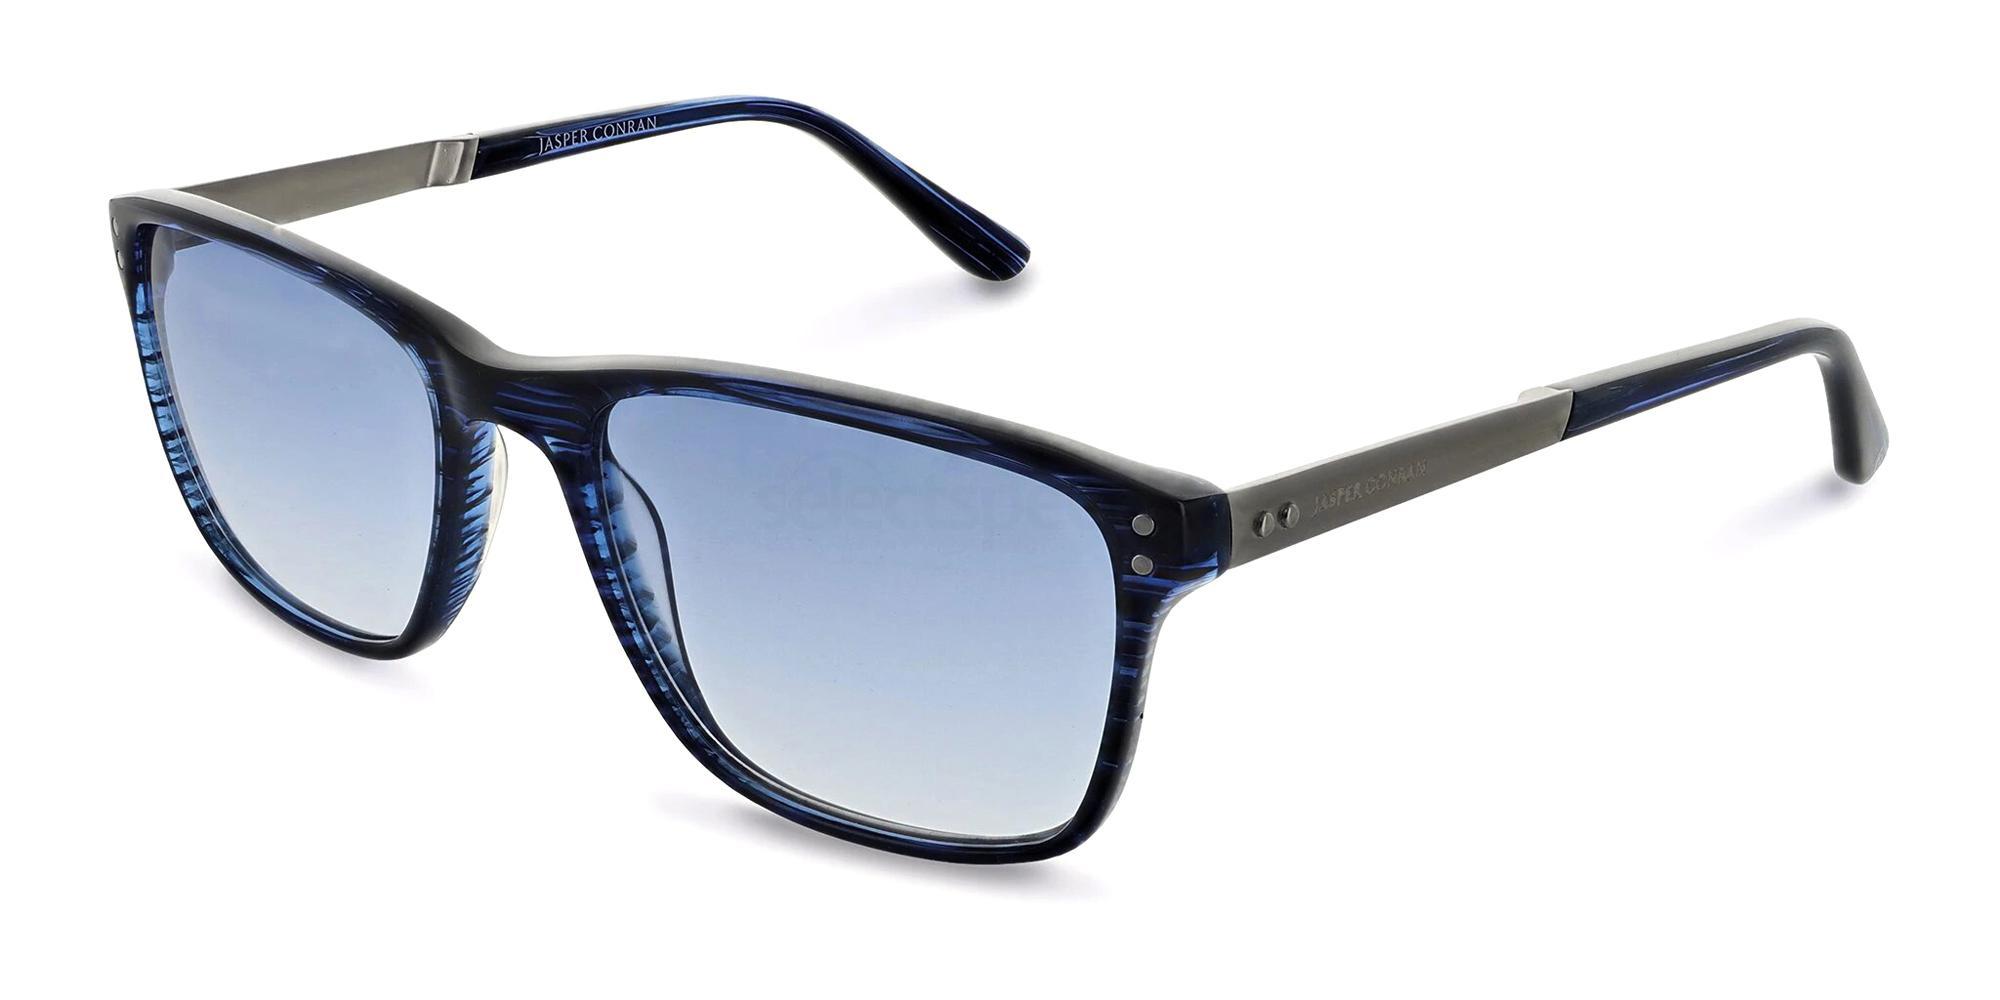 C2 JCMSUN05 Sunglasses, Jasper Conran